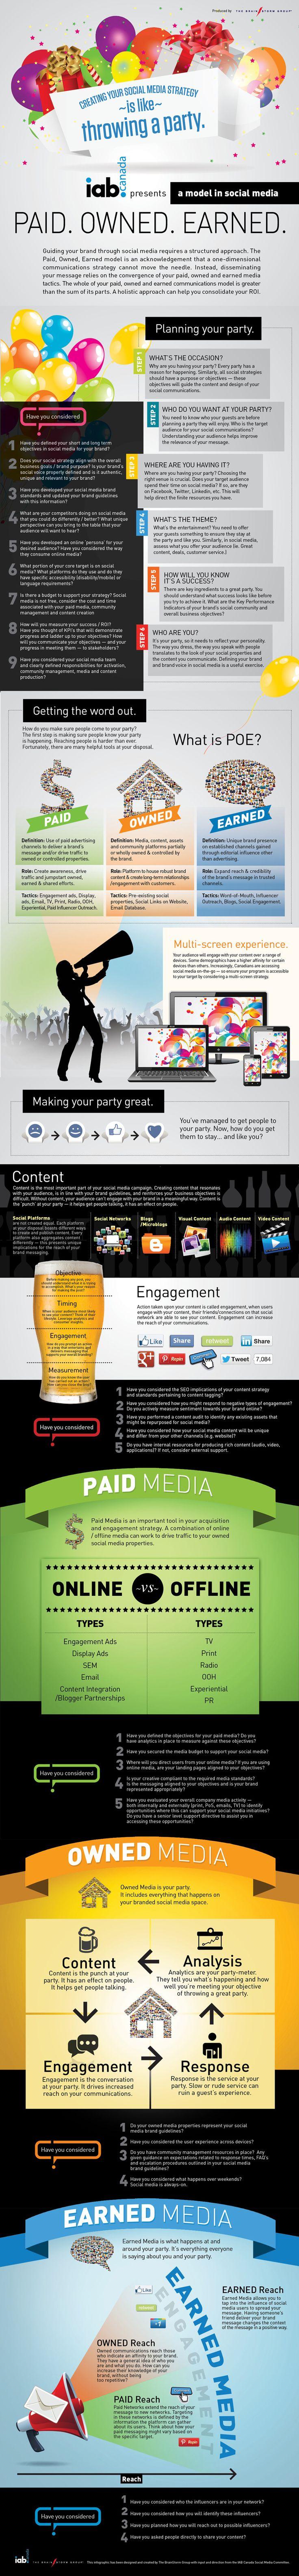 Strategic Business Model For Effective Social Media Marketing #infographic - @mediabistro RT @mqtodd